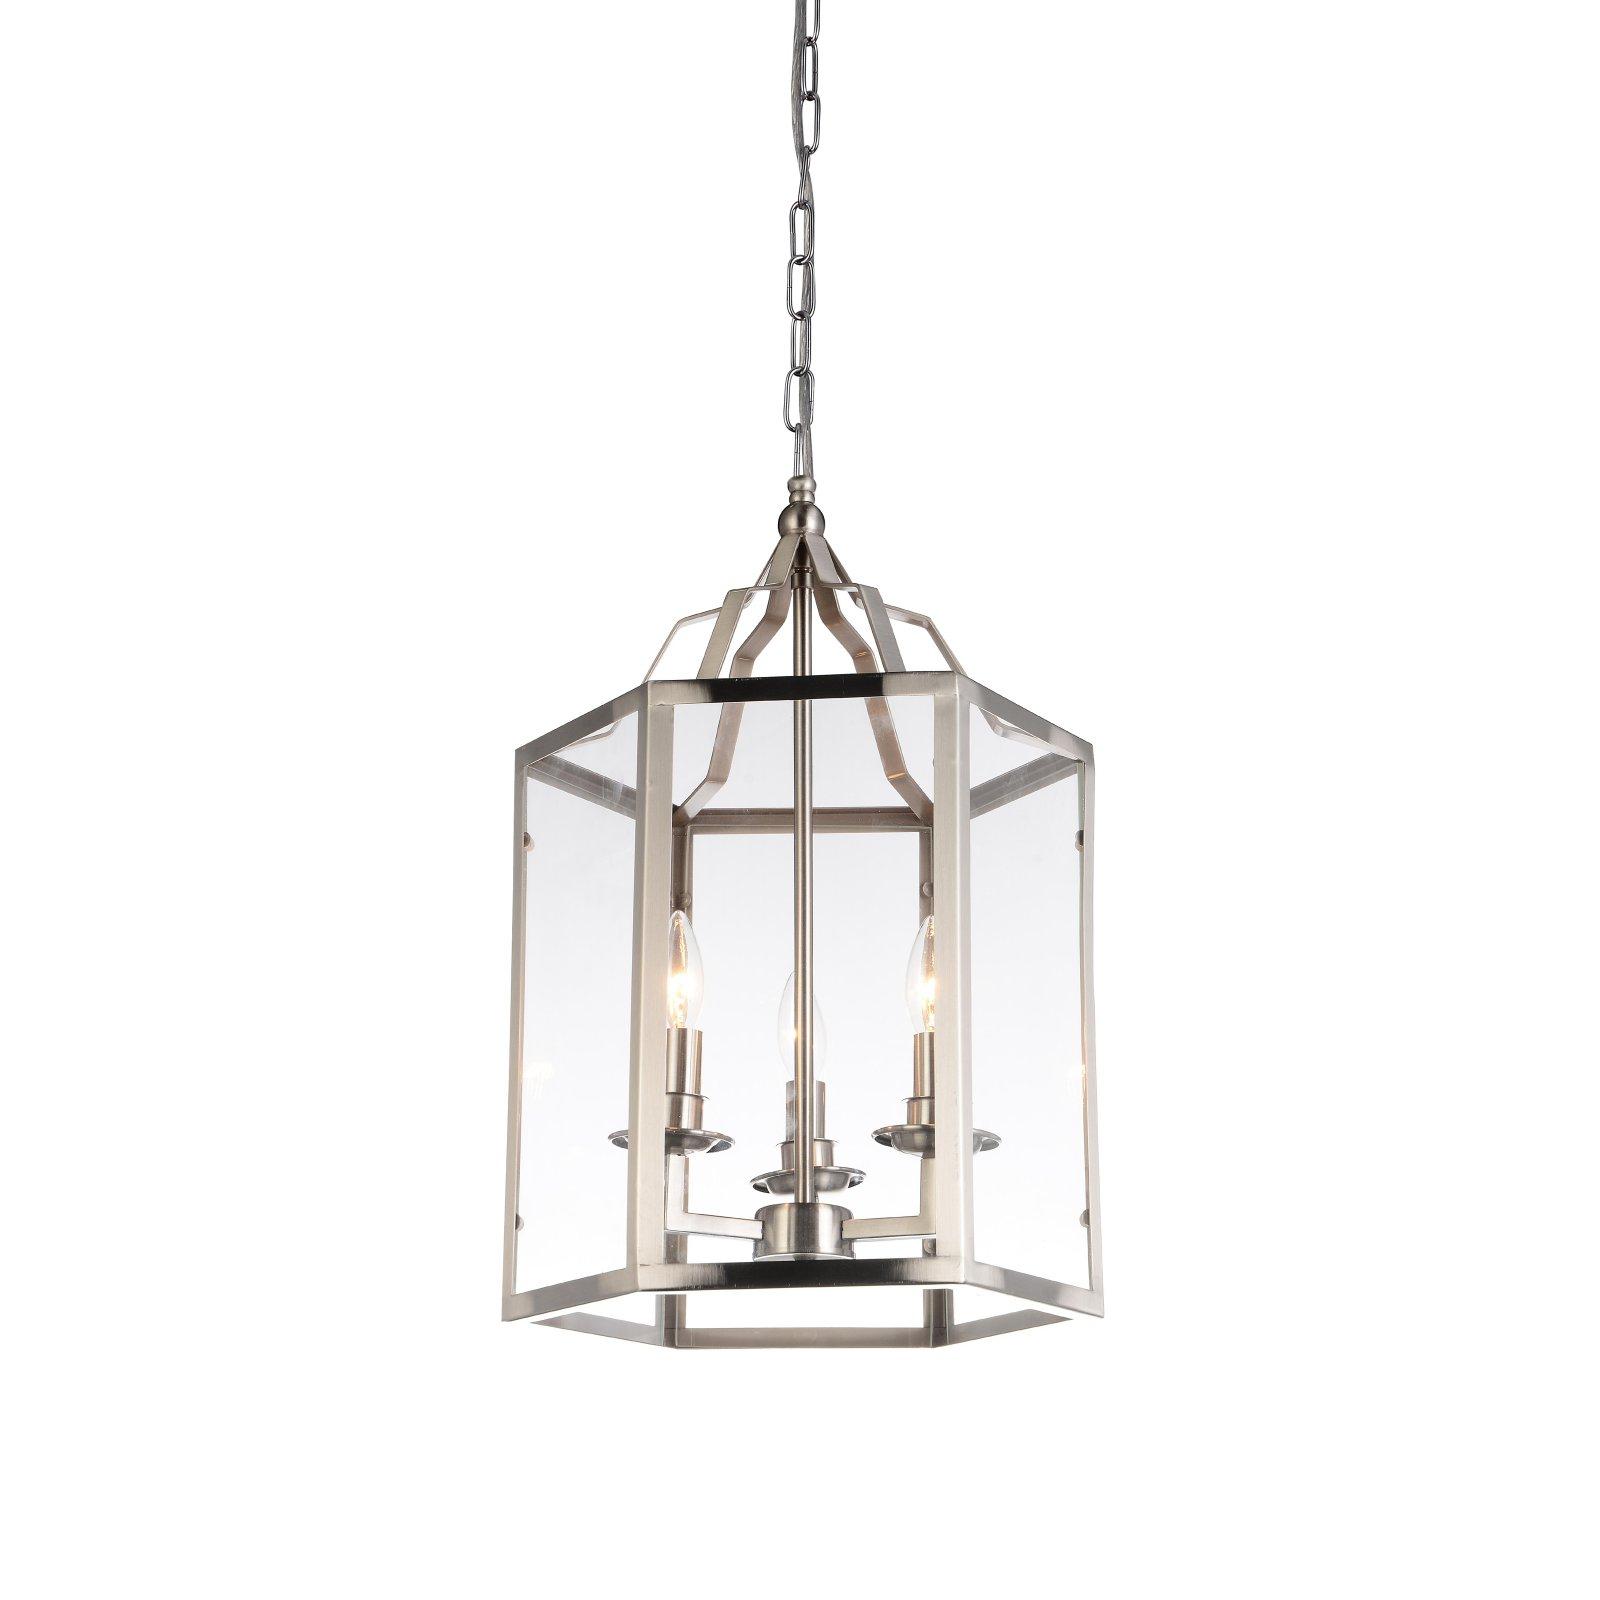 Destrey 3-Light Lantern Square/rectangle Pendants regarding Well-known Cwi Lighting Desire Medium Pendant